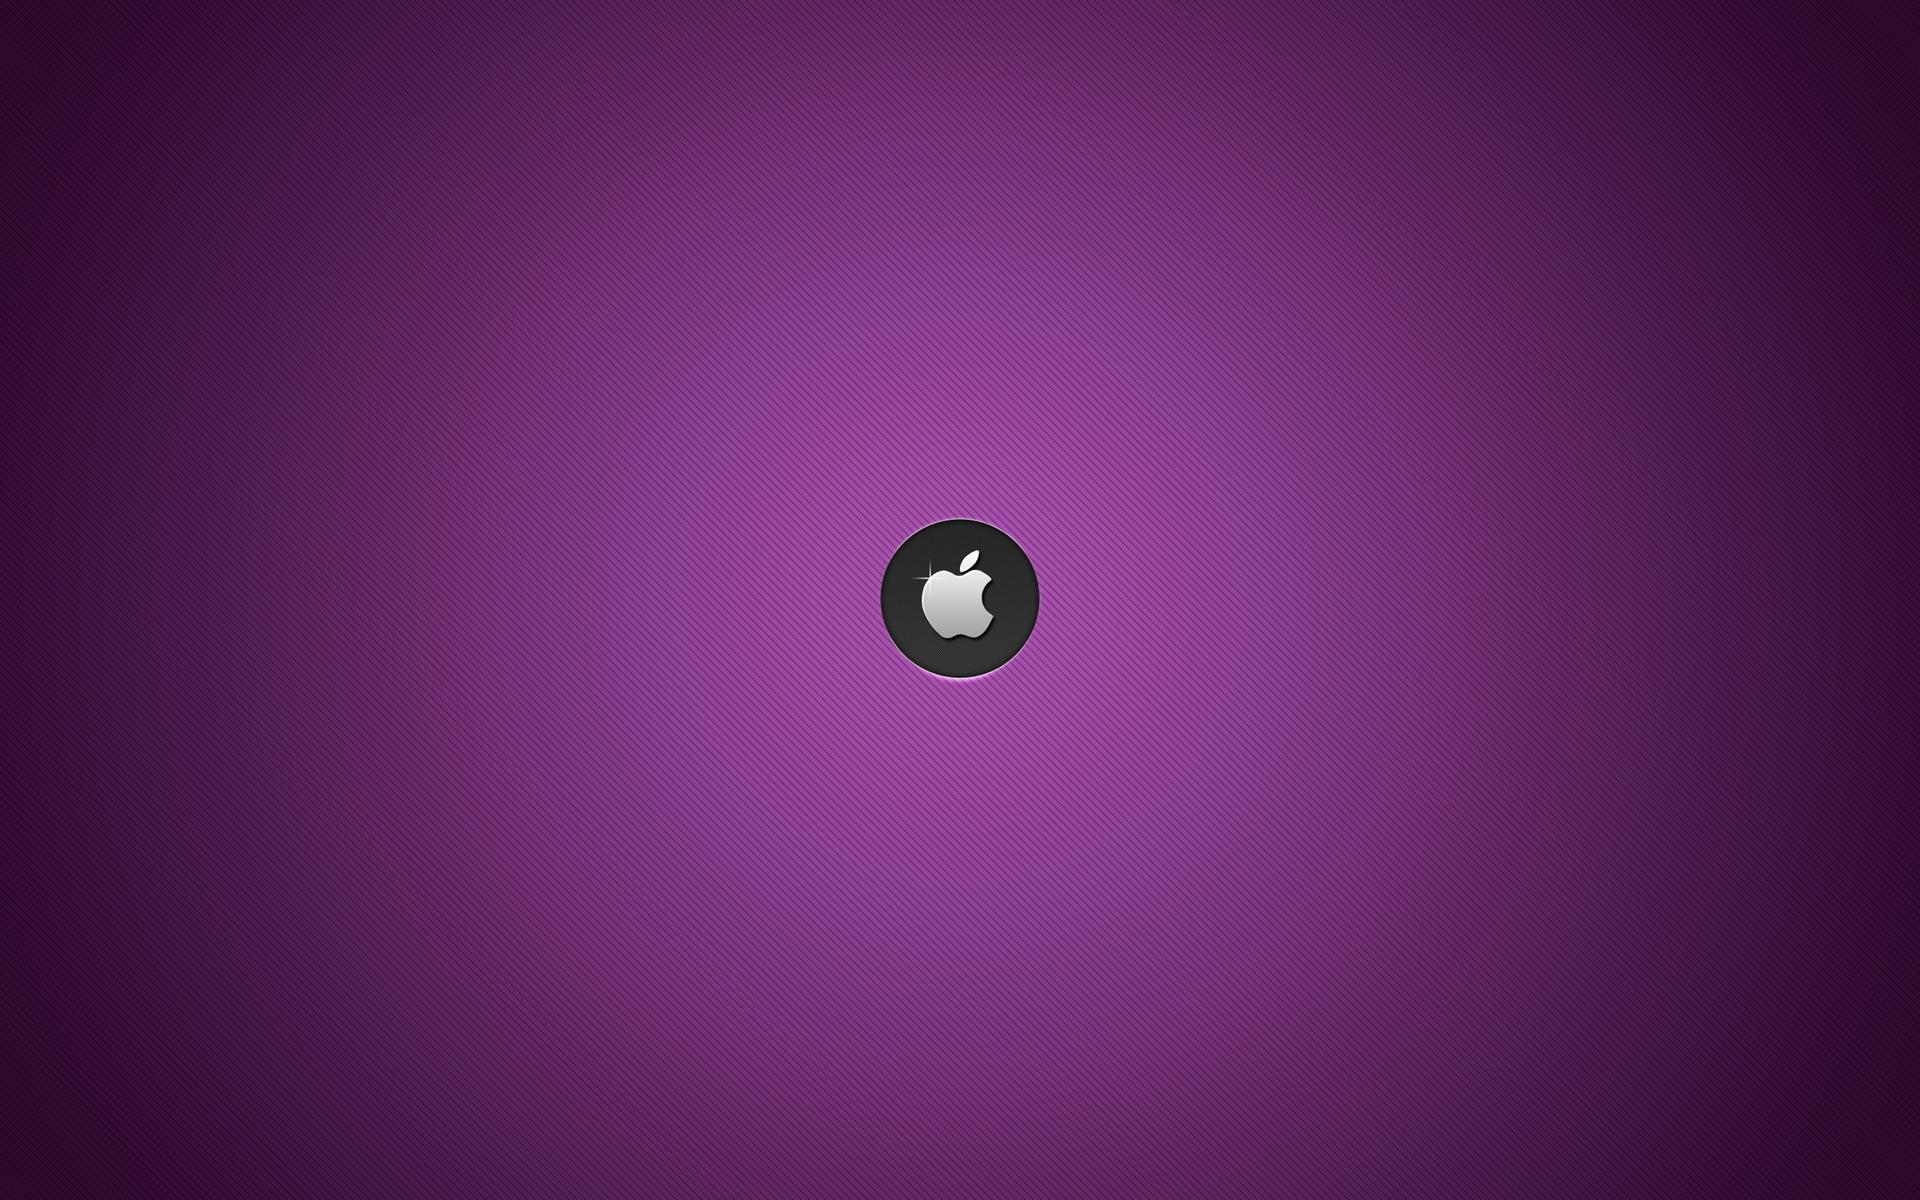 Must see Wallpaper Macbook Purple - apple_candy_wallpaper_apple_computers_2707  Pic_572434.jpg